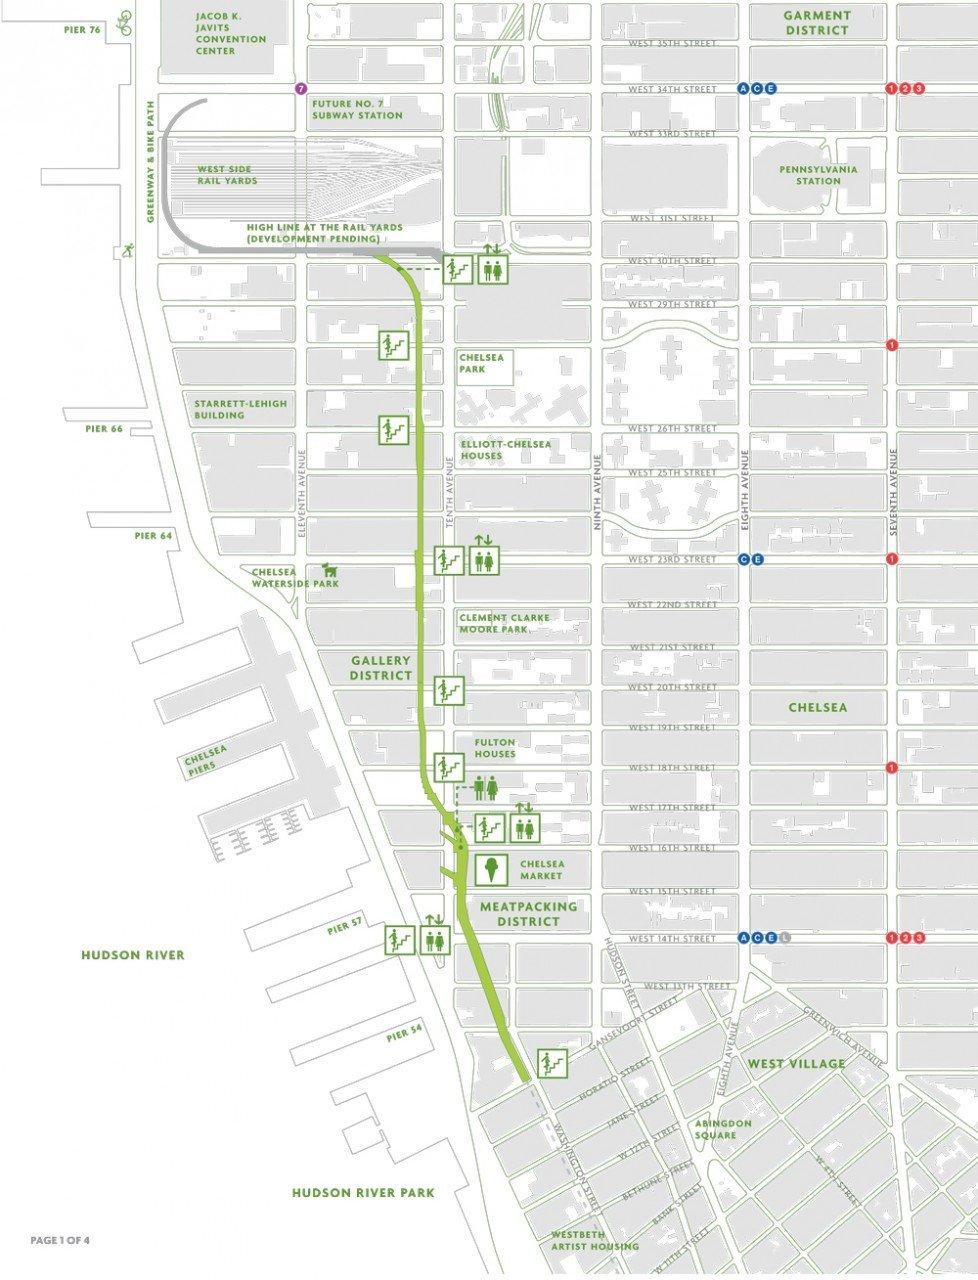 mappa highline, new york high line